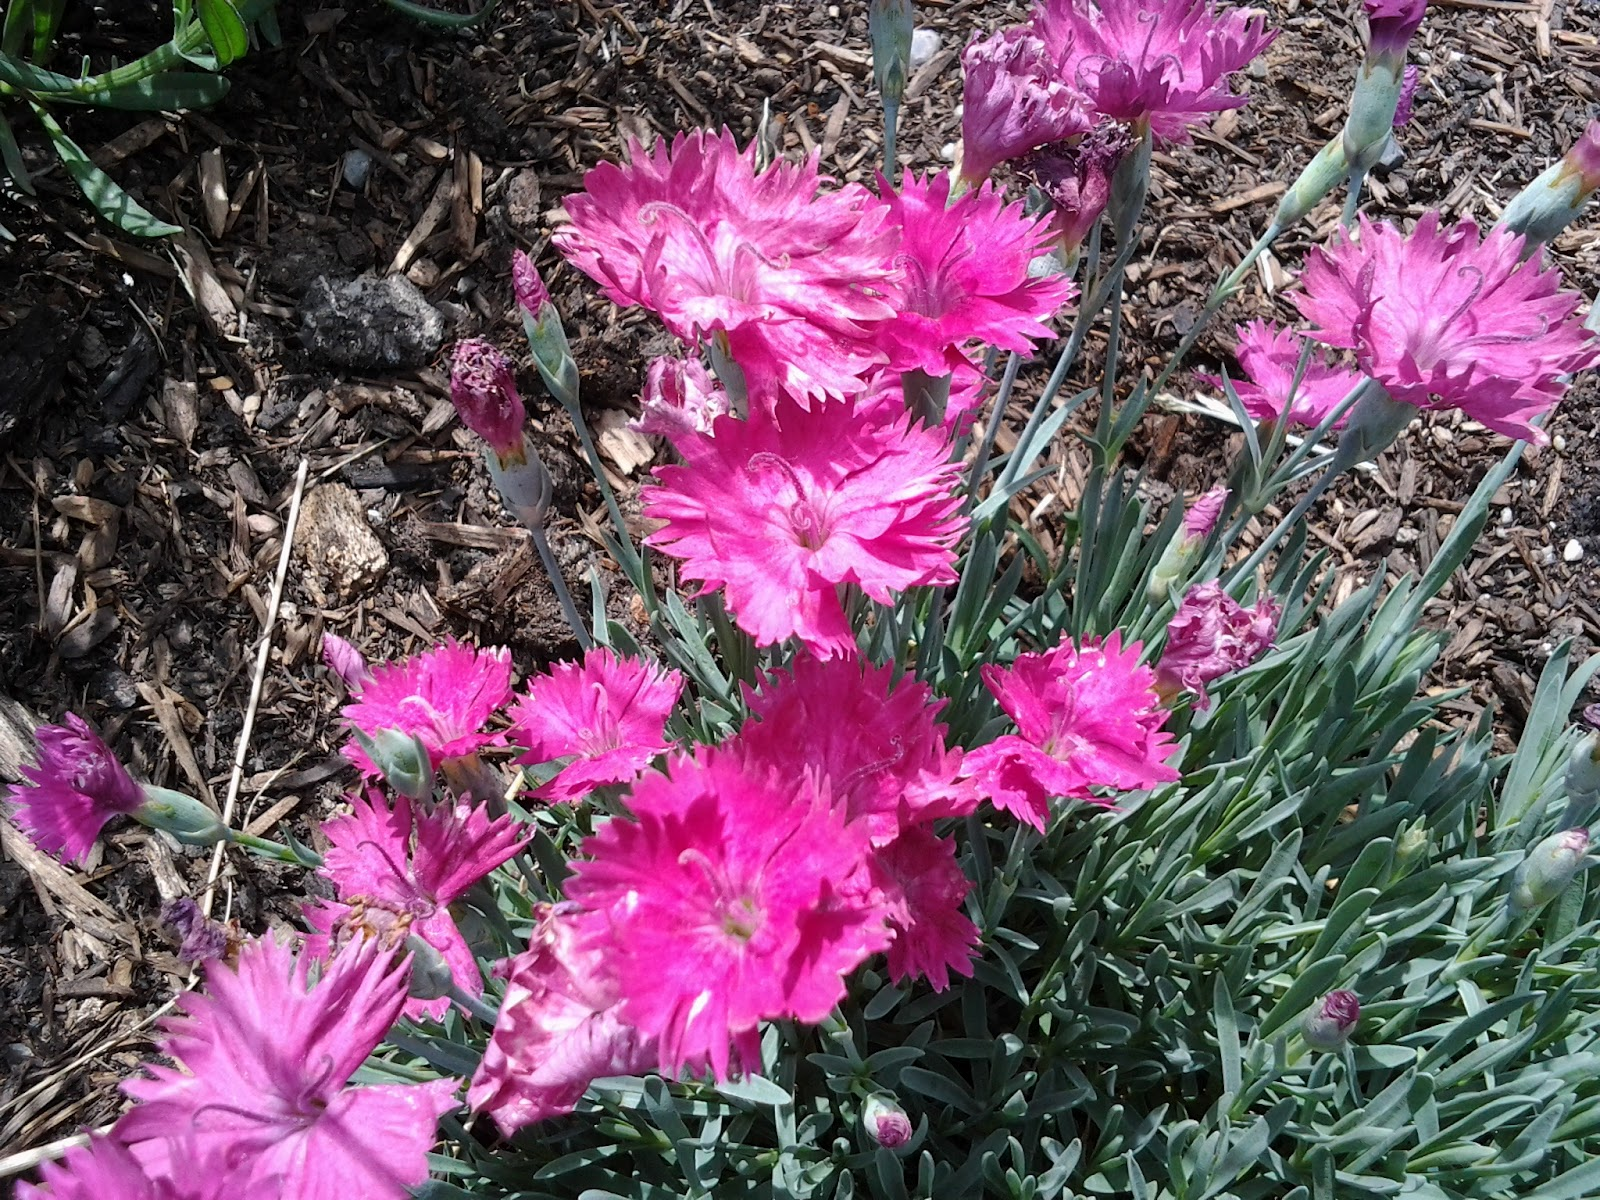 The Organic Suburban Farm Girl Spring Bloomers In The Garden